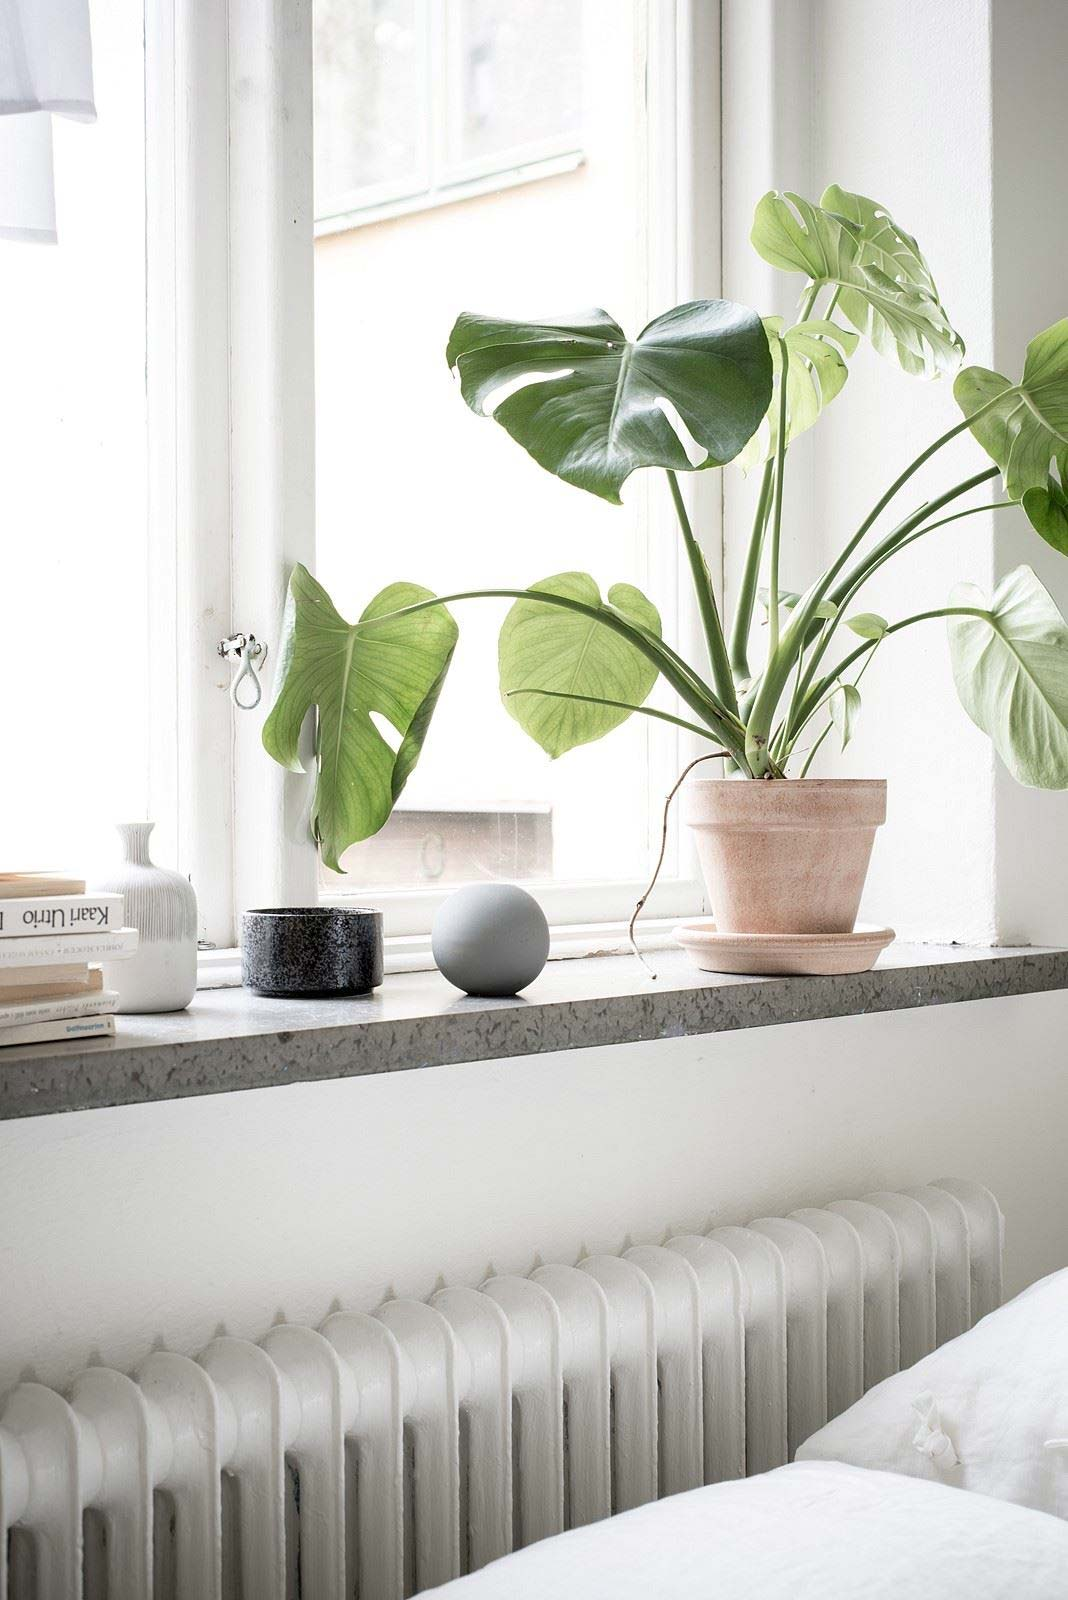 housewarming cadeau idee plant